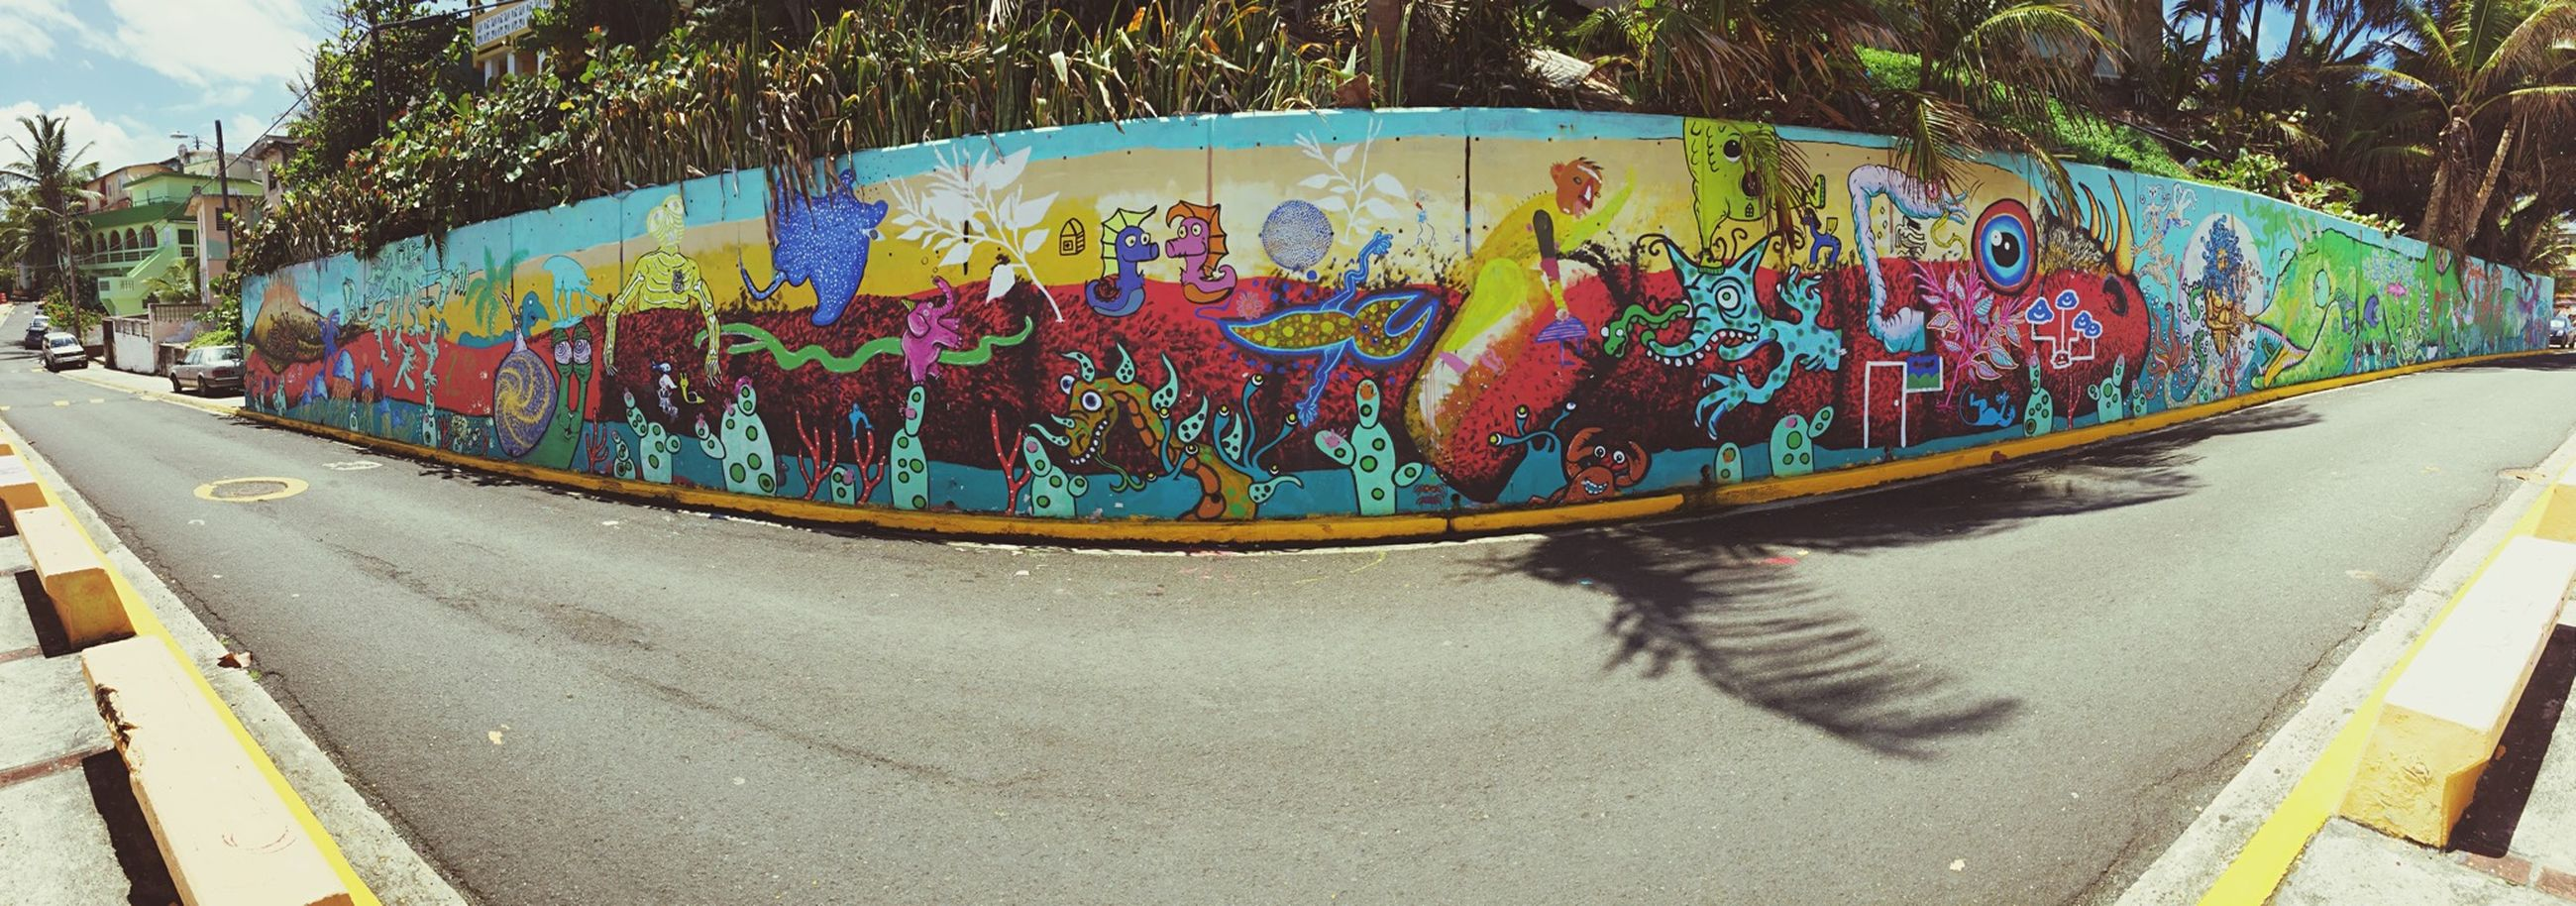 street, road marking, road, transportation, graffiti, art, text, multi colored, art and craft, tree, creativity, the way forward, city, asphalt, sidewalk, outdoors, building exterior, day, car, built structure